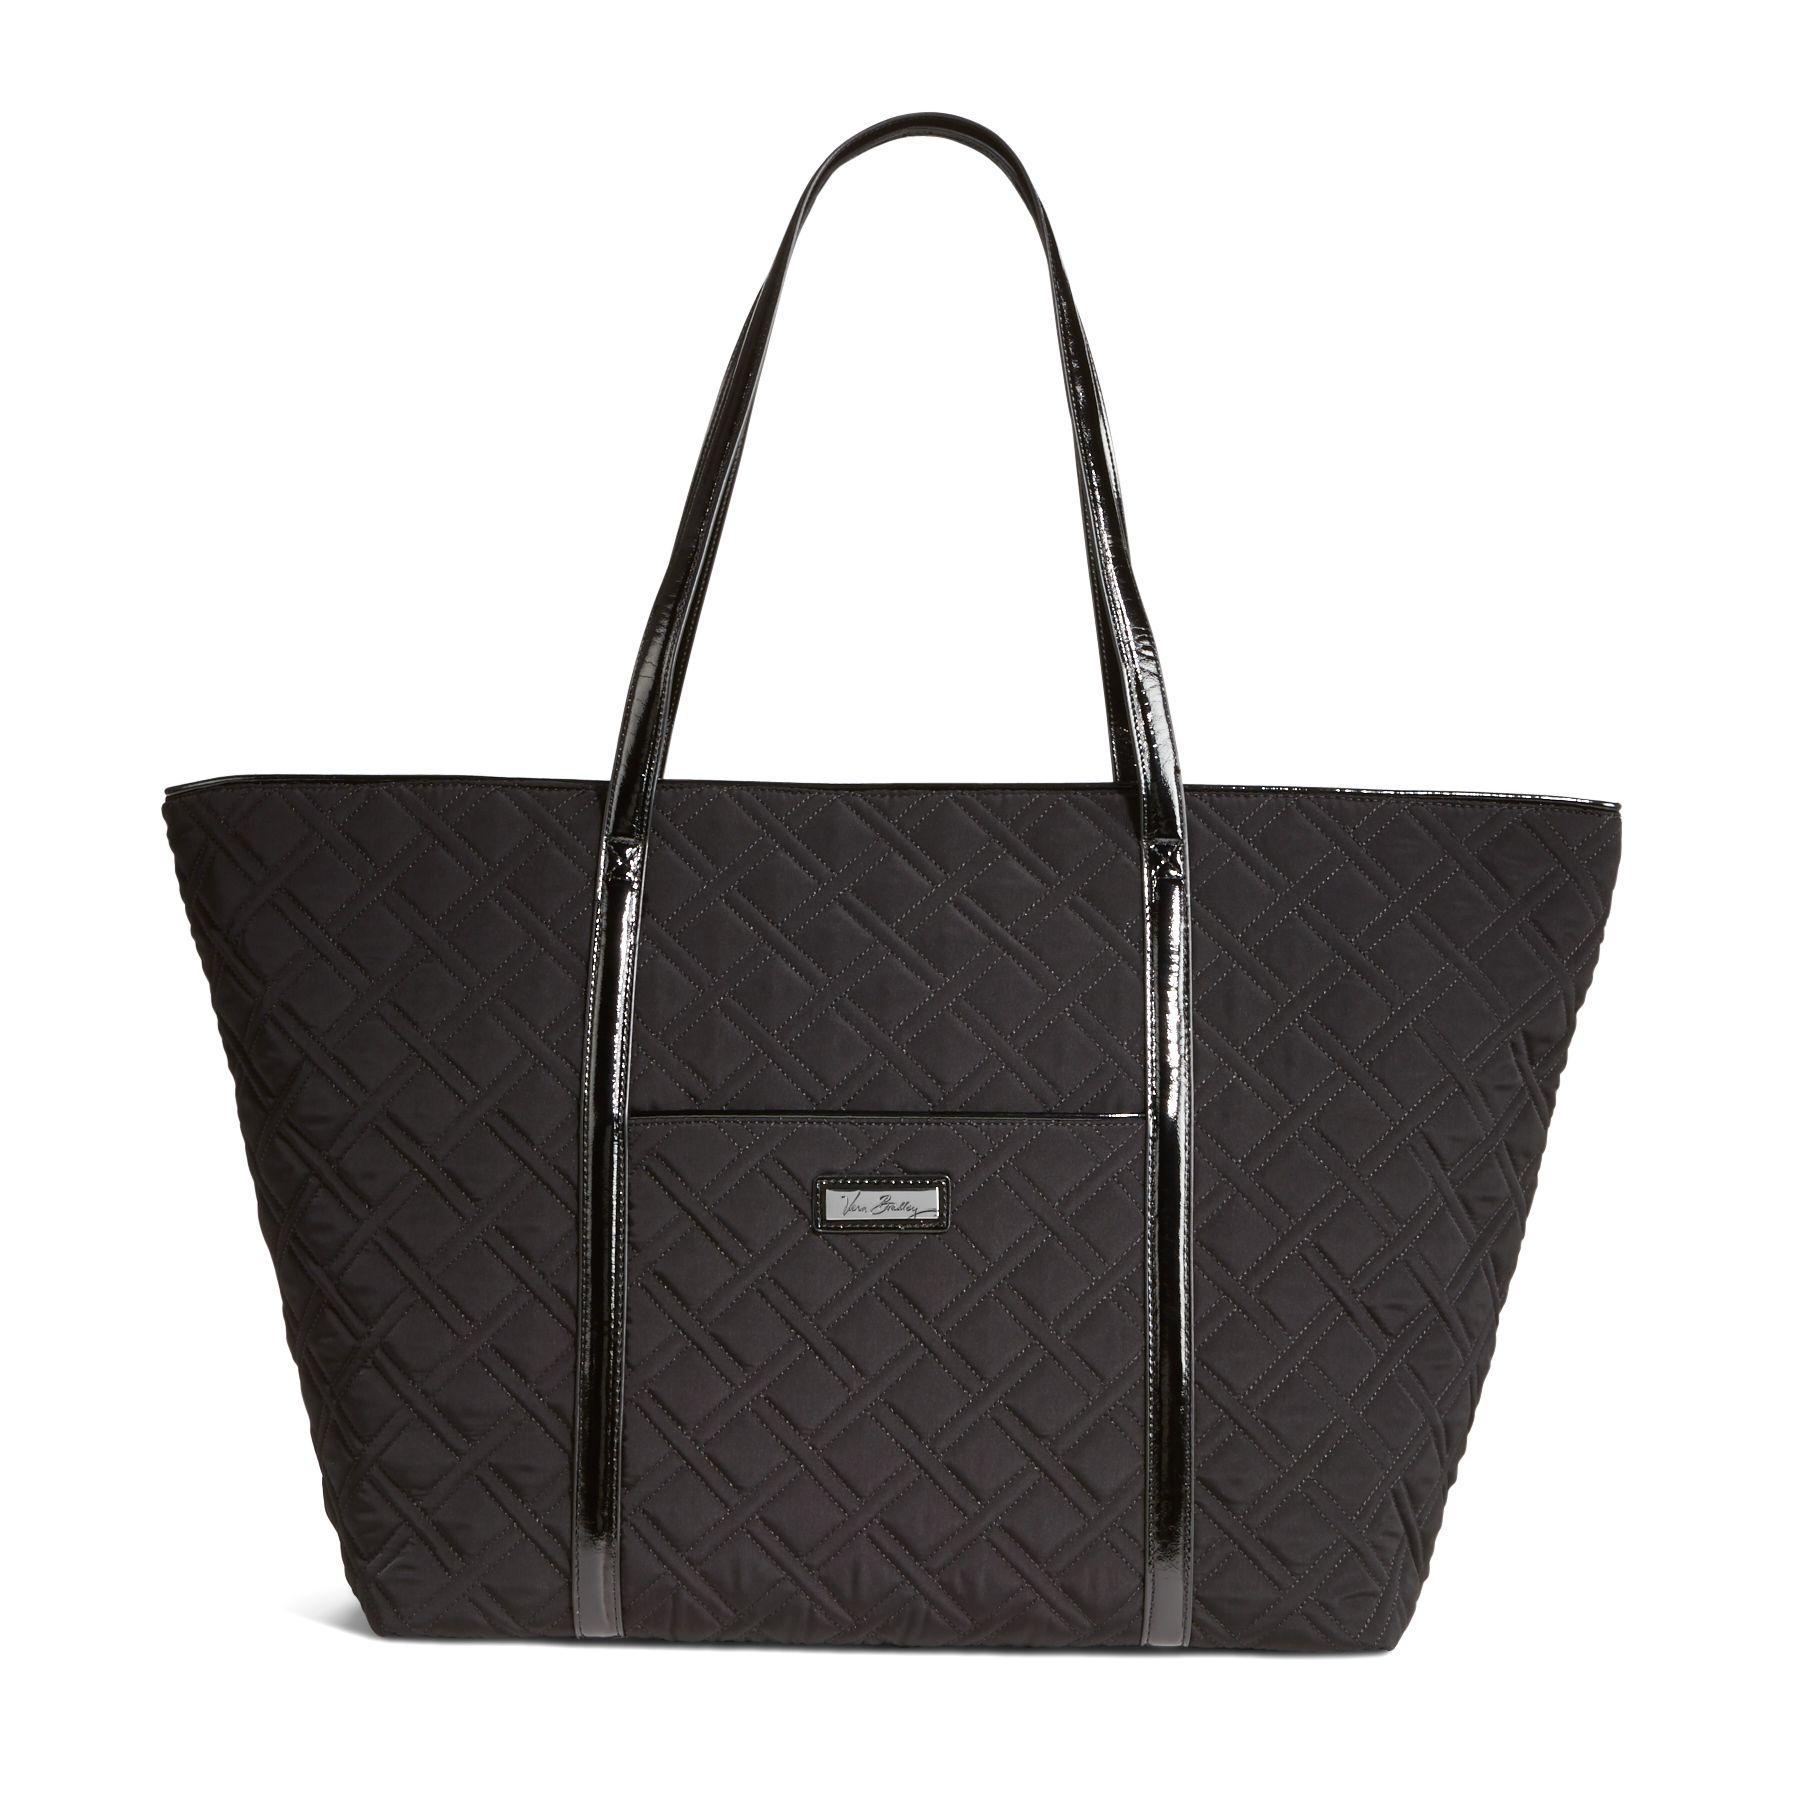 Vera Bradley Trimmed Vera Traveler Bag in Classic Black with Black Trim